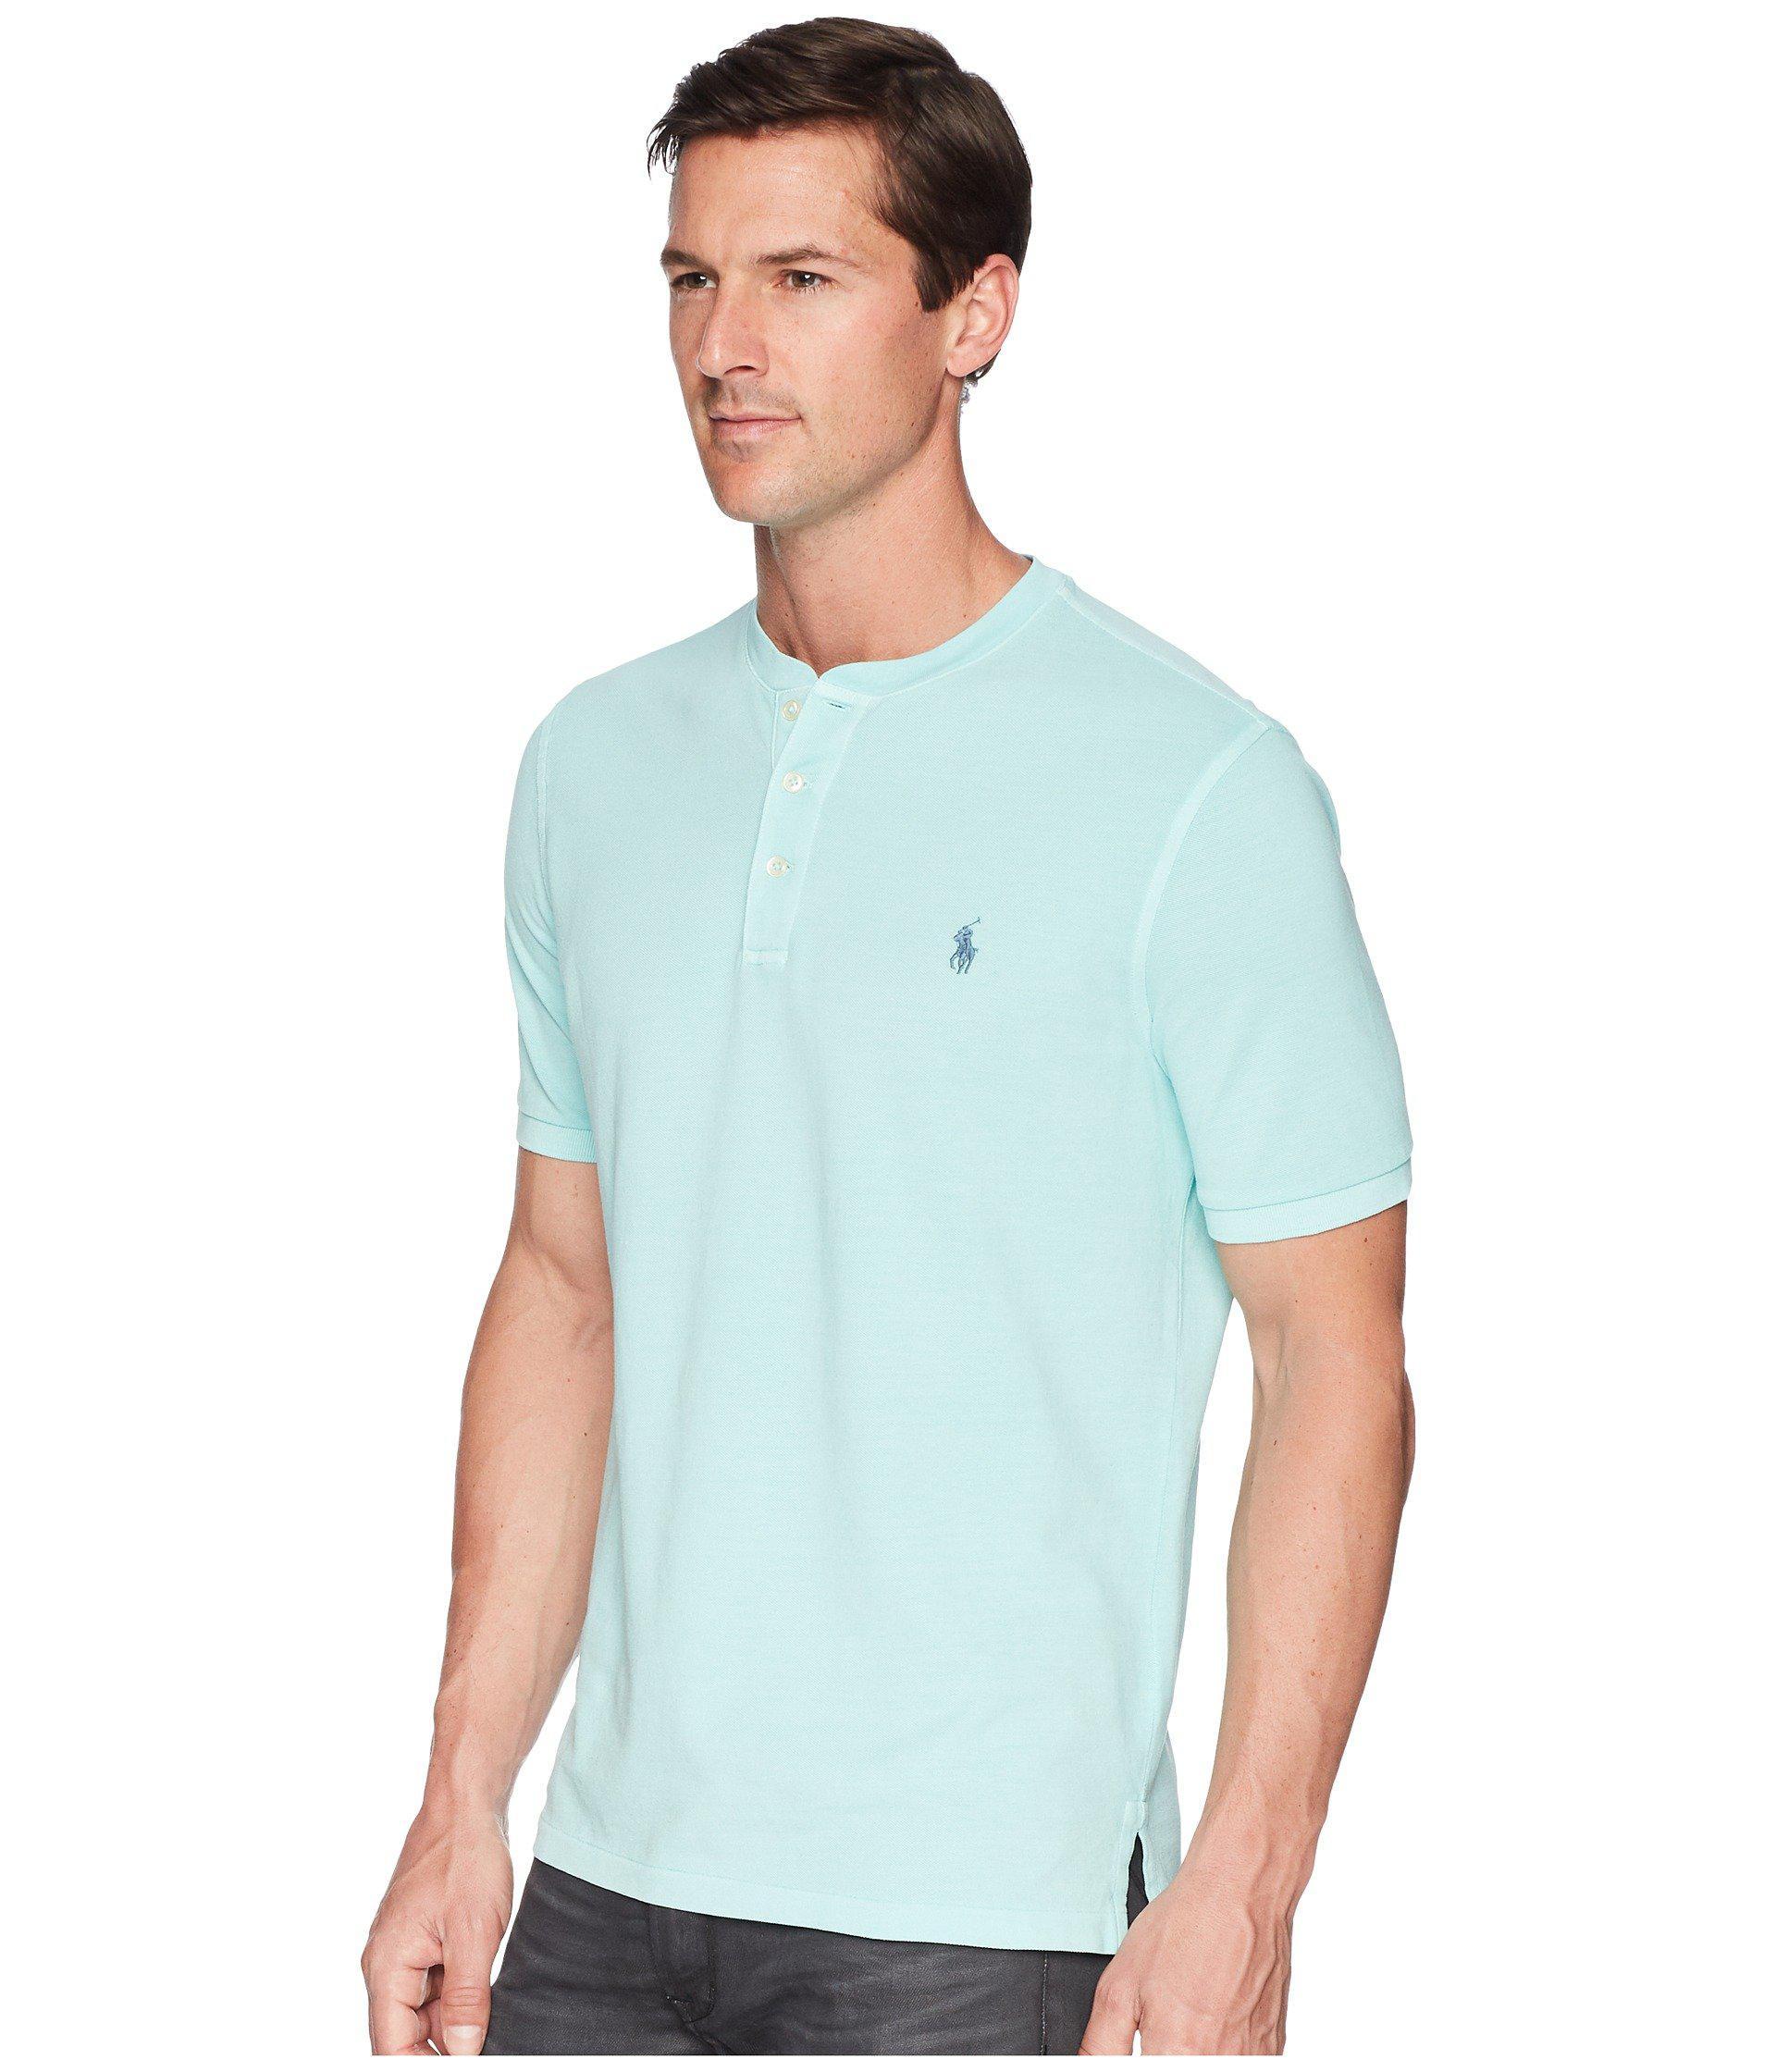 124cf4c52d2a4 polo-ralph-lauren-Bayside-Green-Featherweight-Mesh-Short-Sleeve-Knit-Henley- polo-Black-Mens-Clothing.jpeg